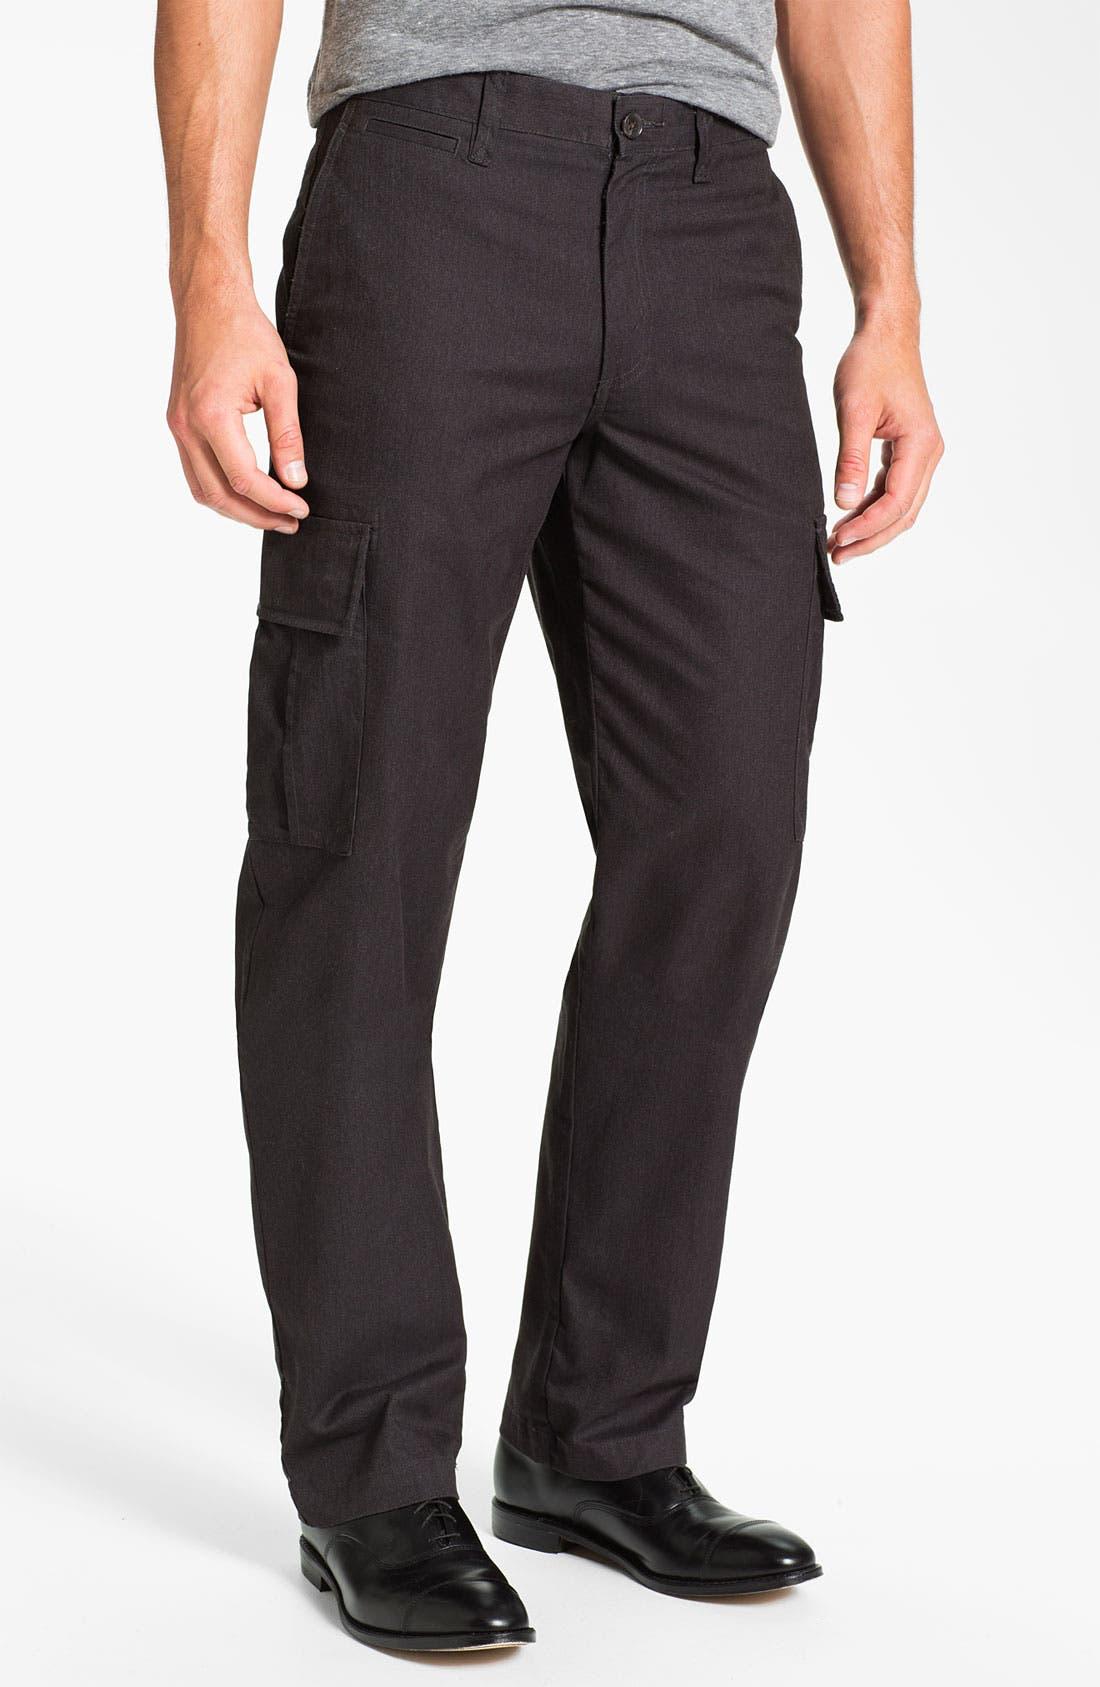 Alternate Image 1 Selected - Wallin & Bros. 'Milner' Cargo Pants